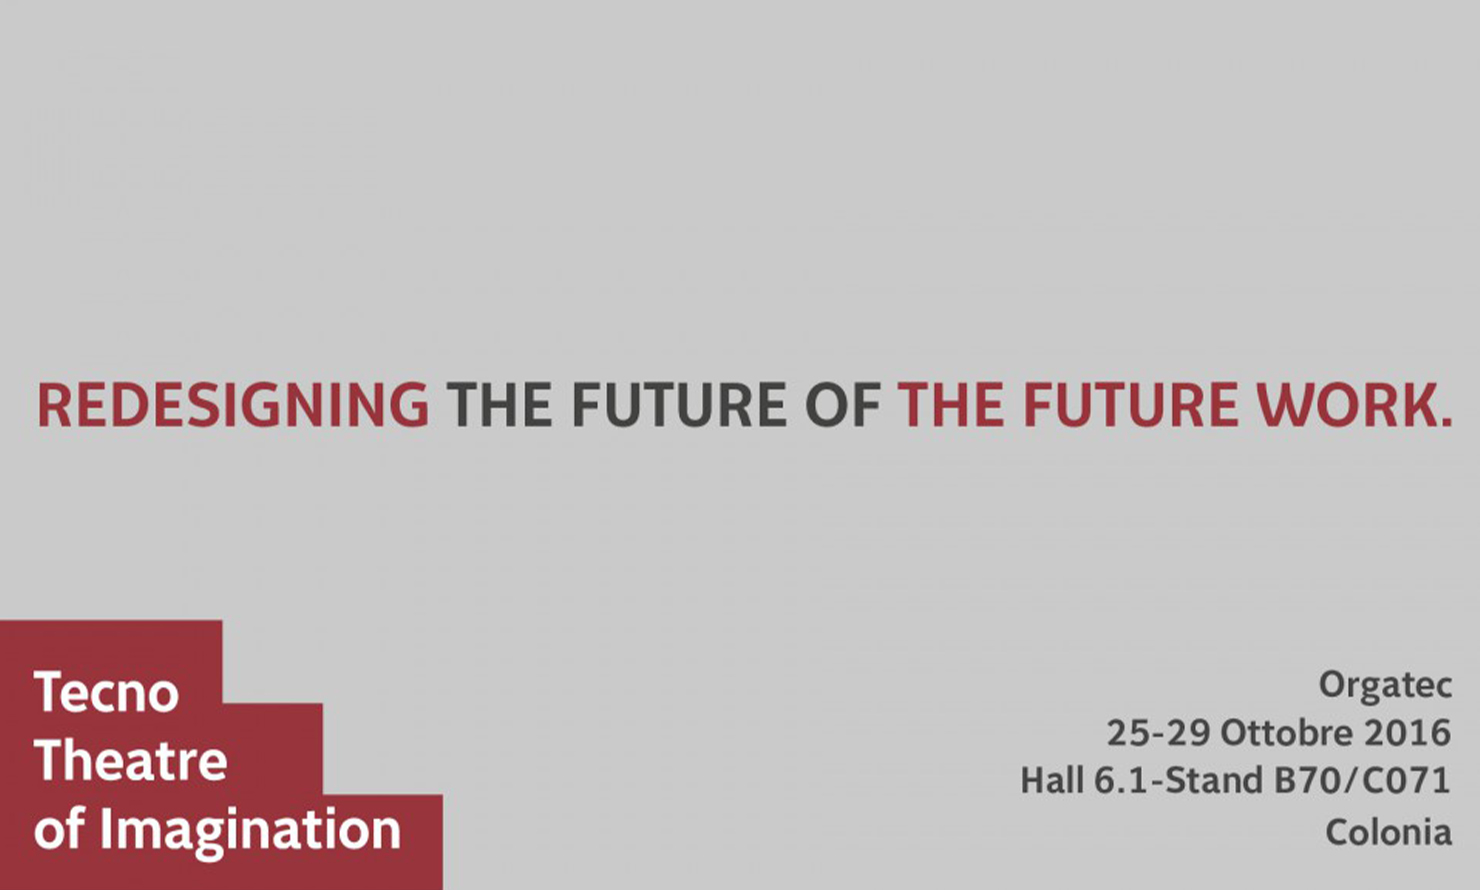 https://www.kubelibre.com/uploads/Slider-work-tutti-clienti/tecno-redesigning-the-future-of-the-future-of-work-15.jpg